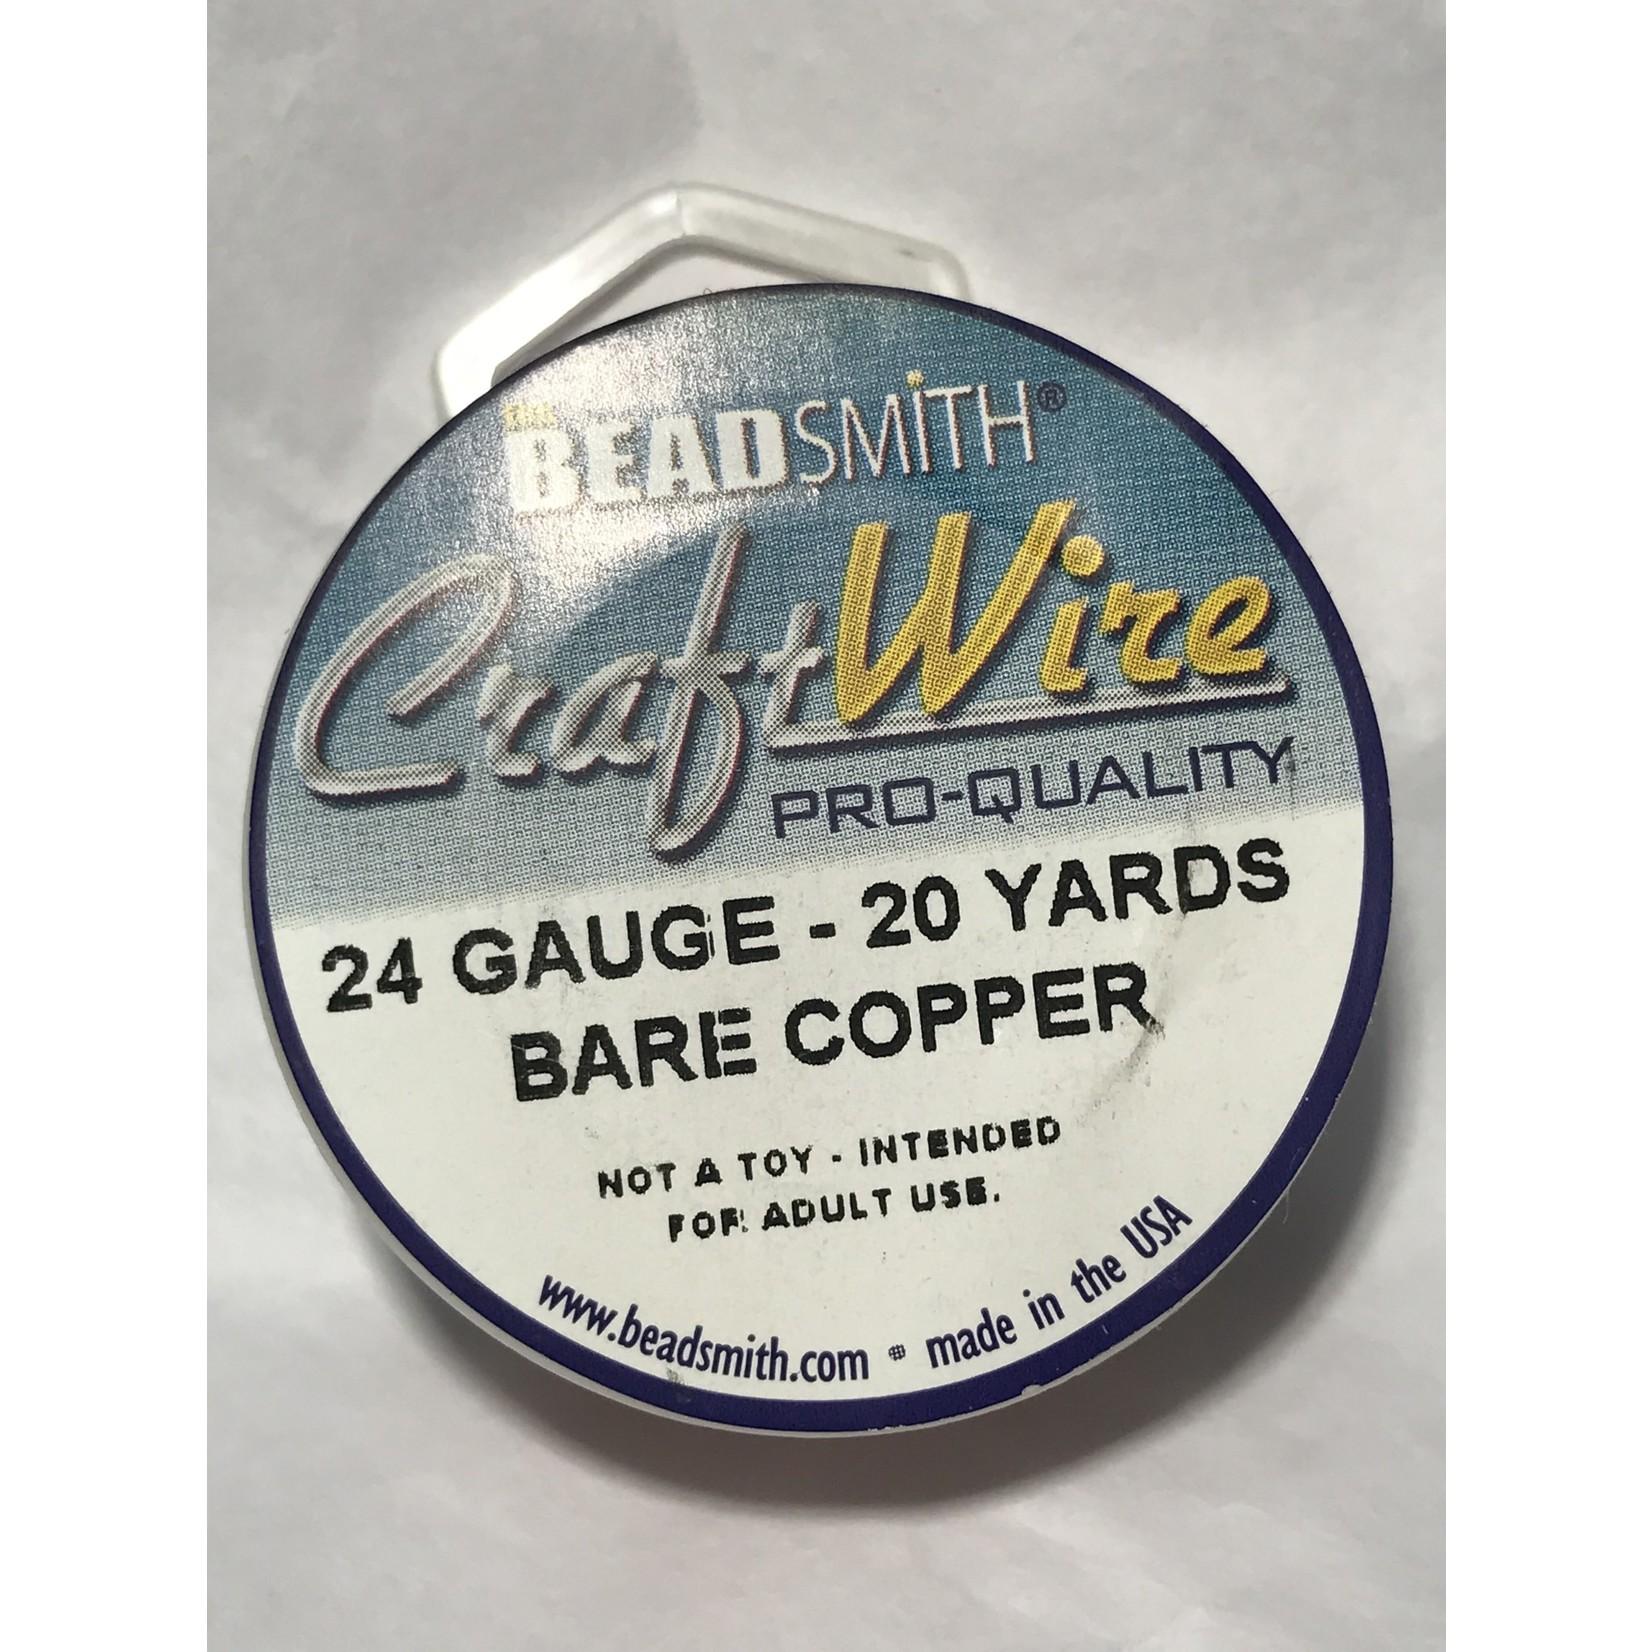 BeadSmith Bare Copper Wire - 24 Gauge Round 20 Yards